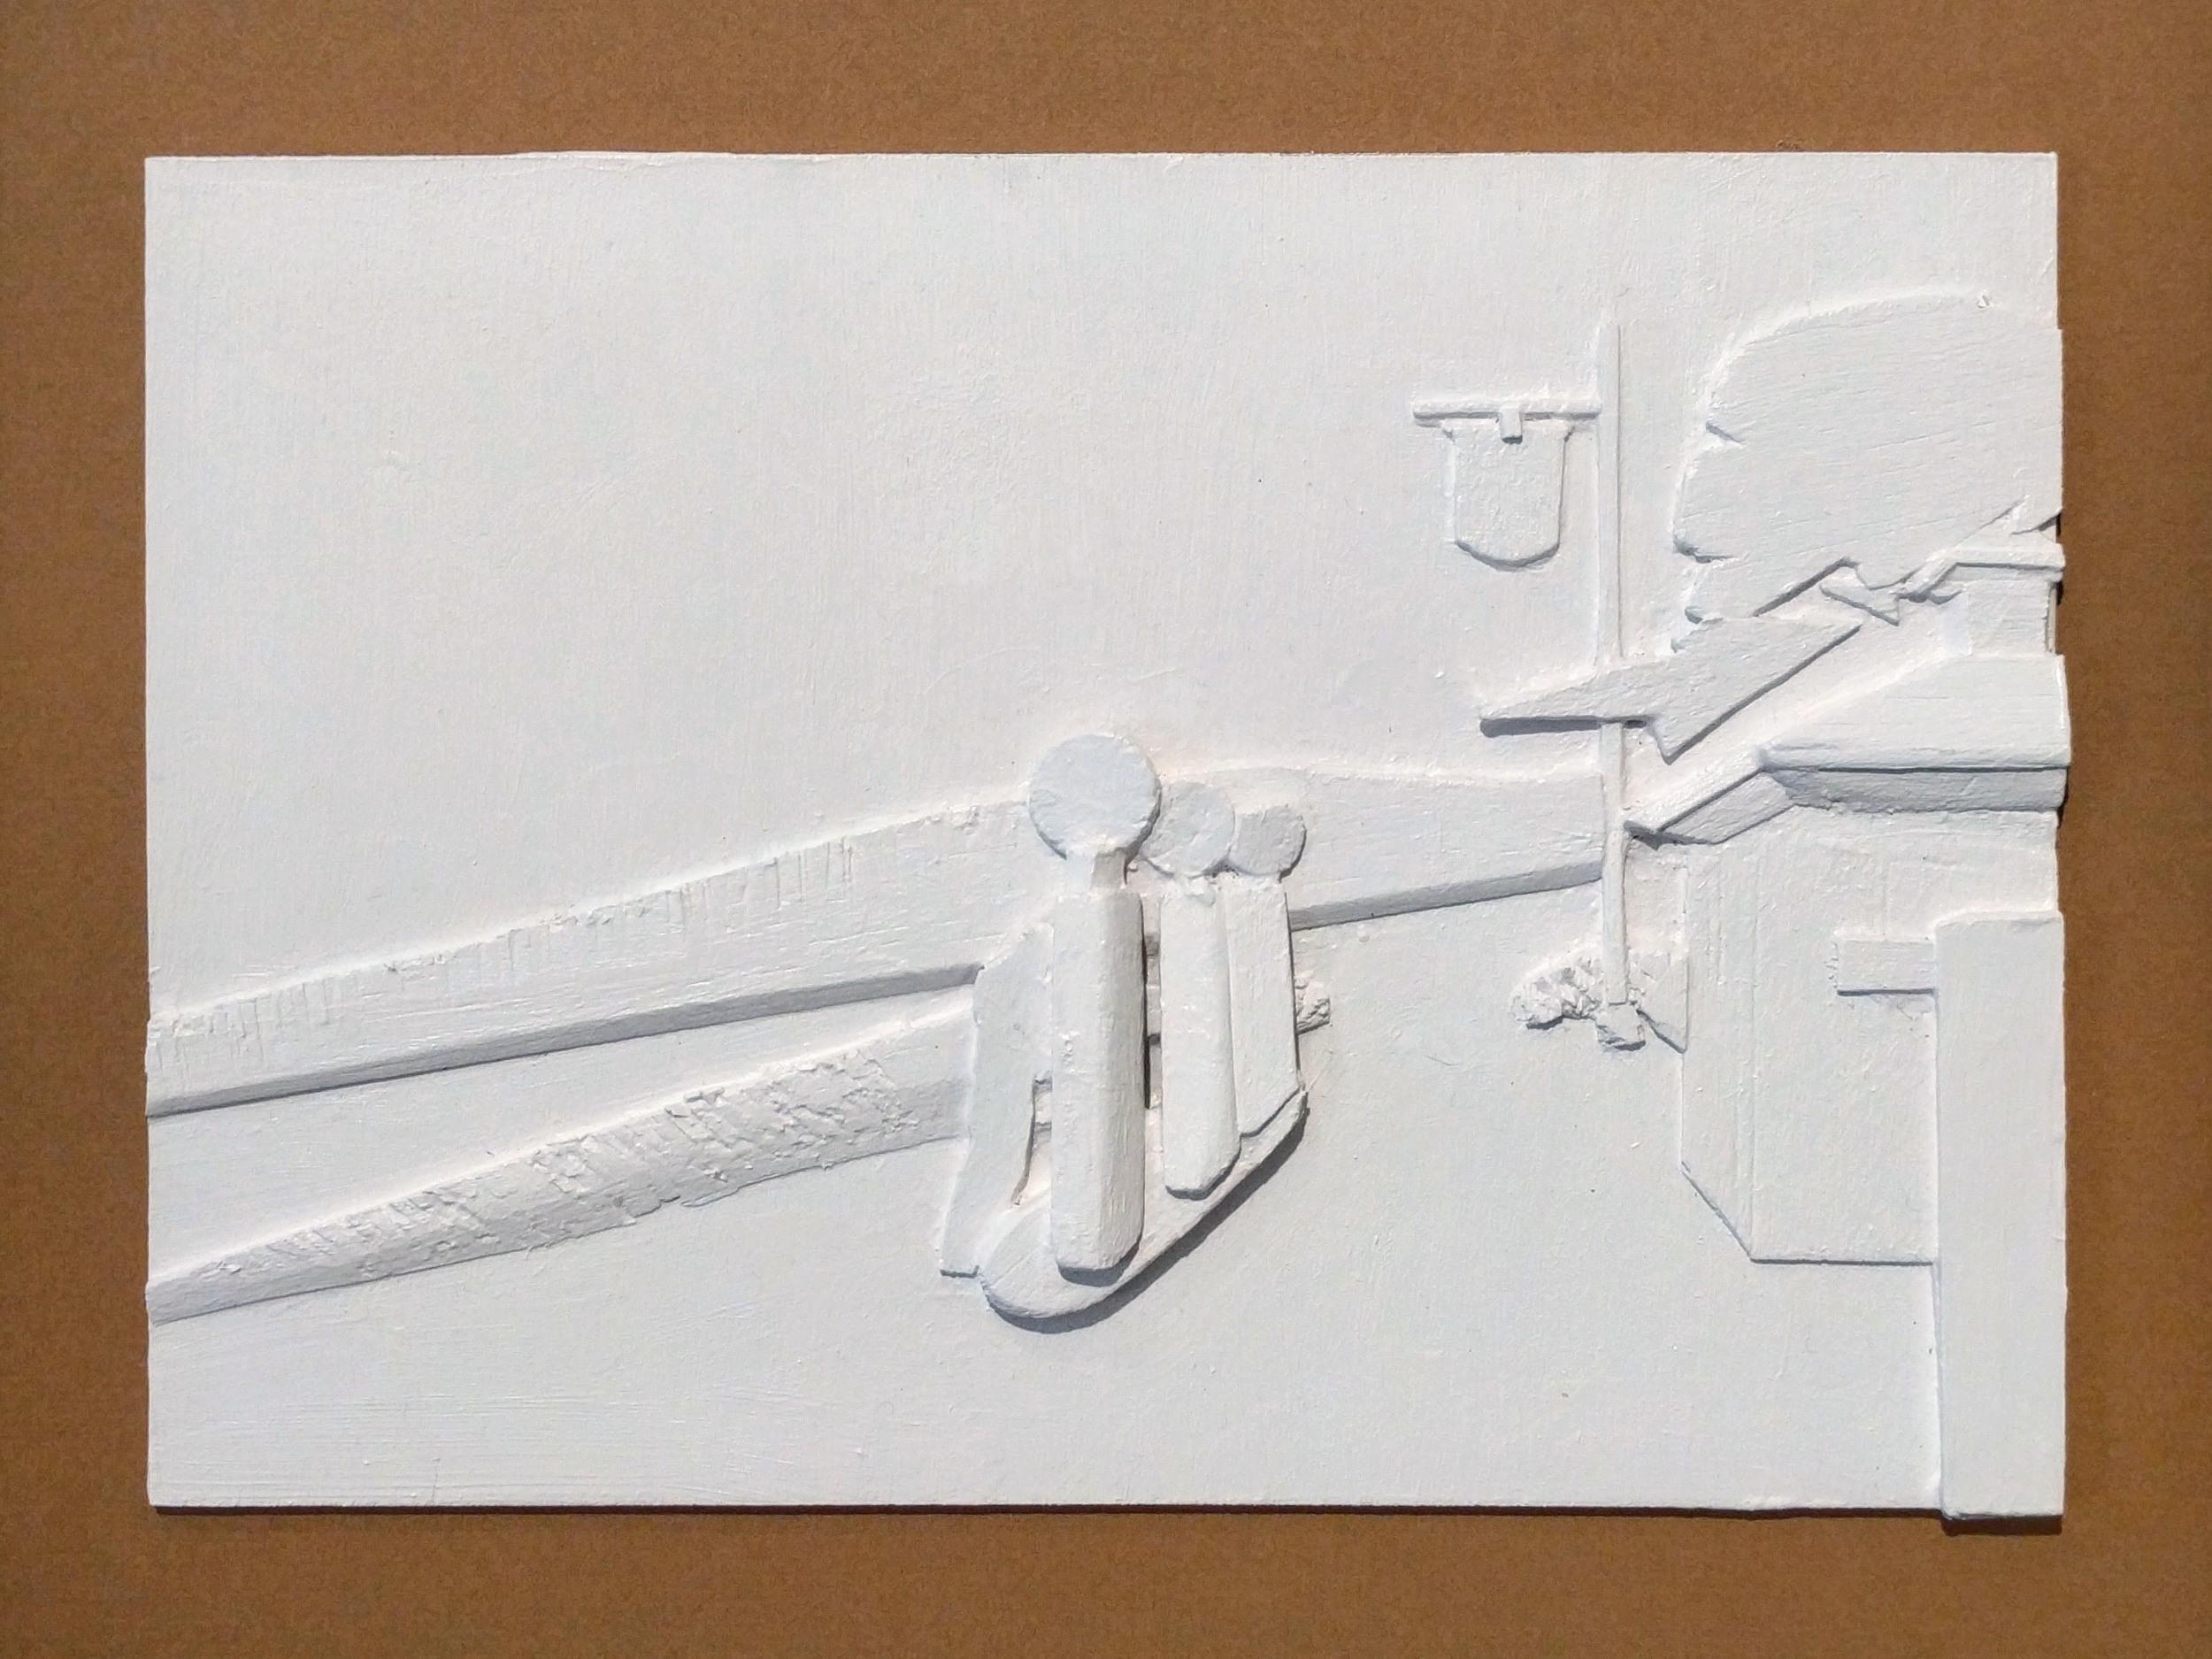 "William Rauschenberg ""After Hopper: Gas"" 2016 acrylic on balsa wood, 16 x 12 1/2 in."